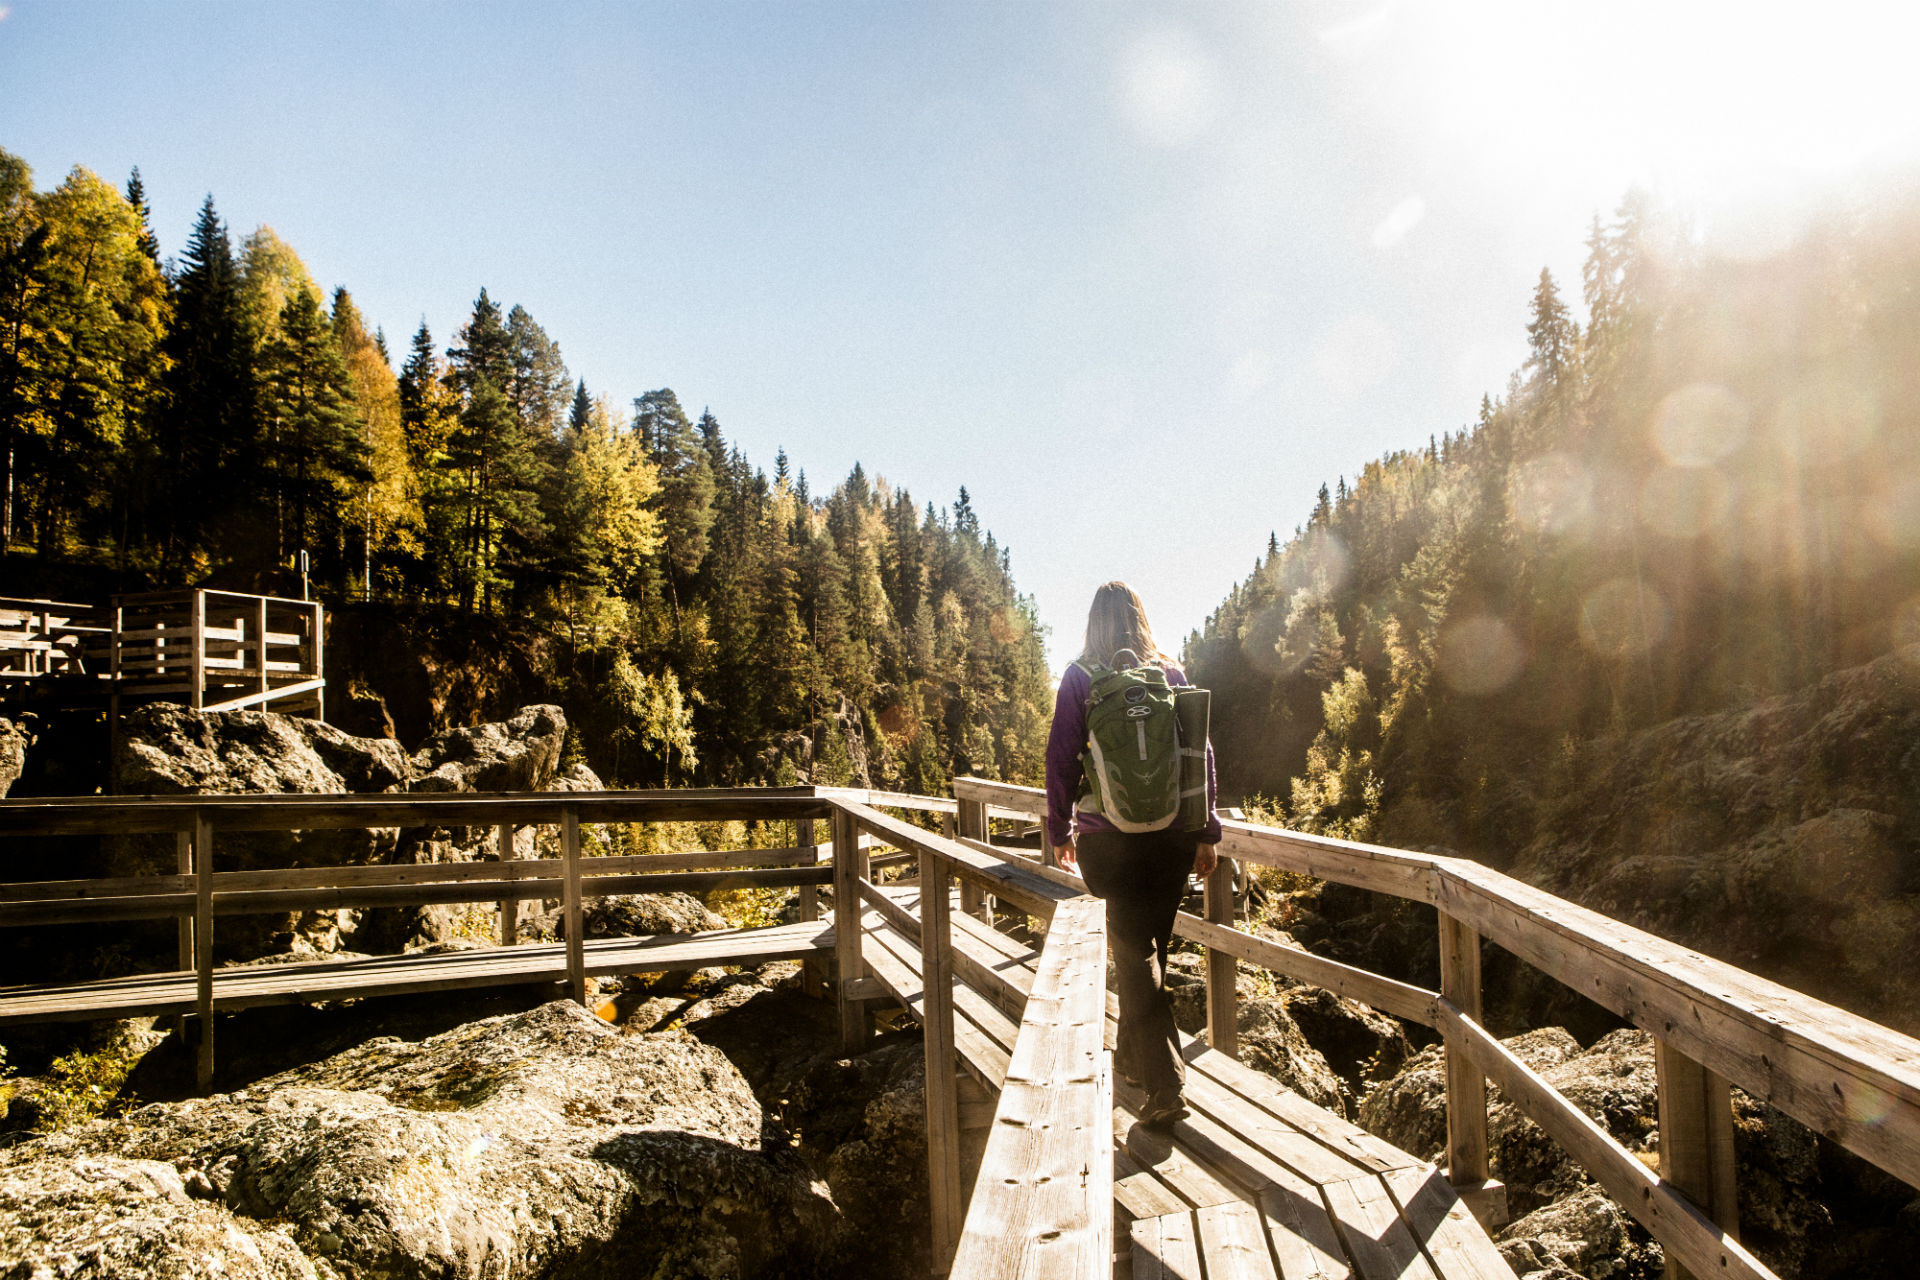 Dead falls in Ragunda | Photo: Niclas Blom